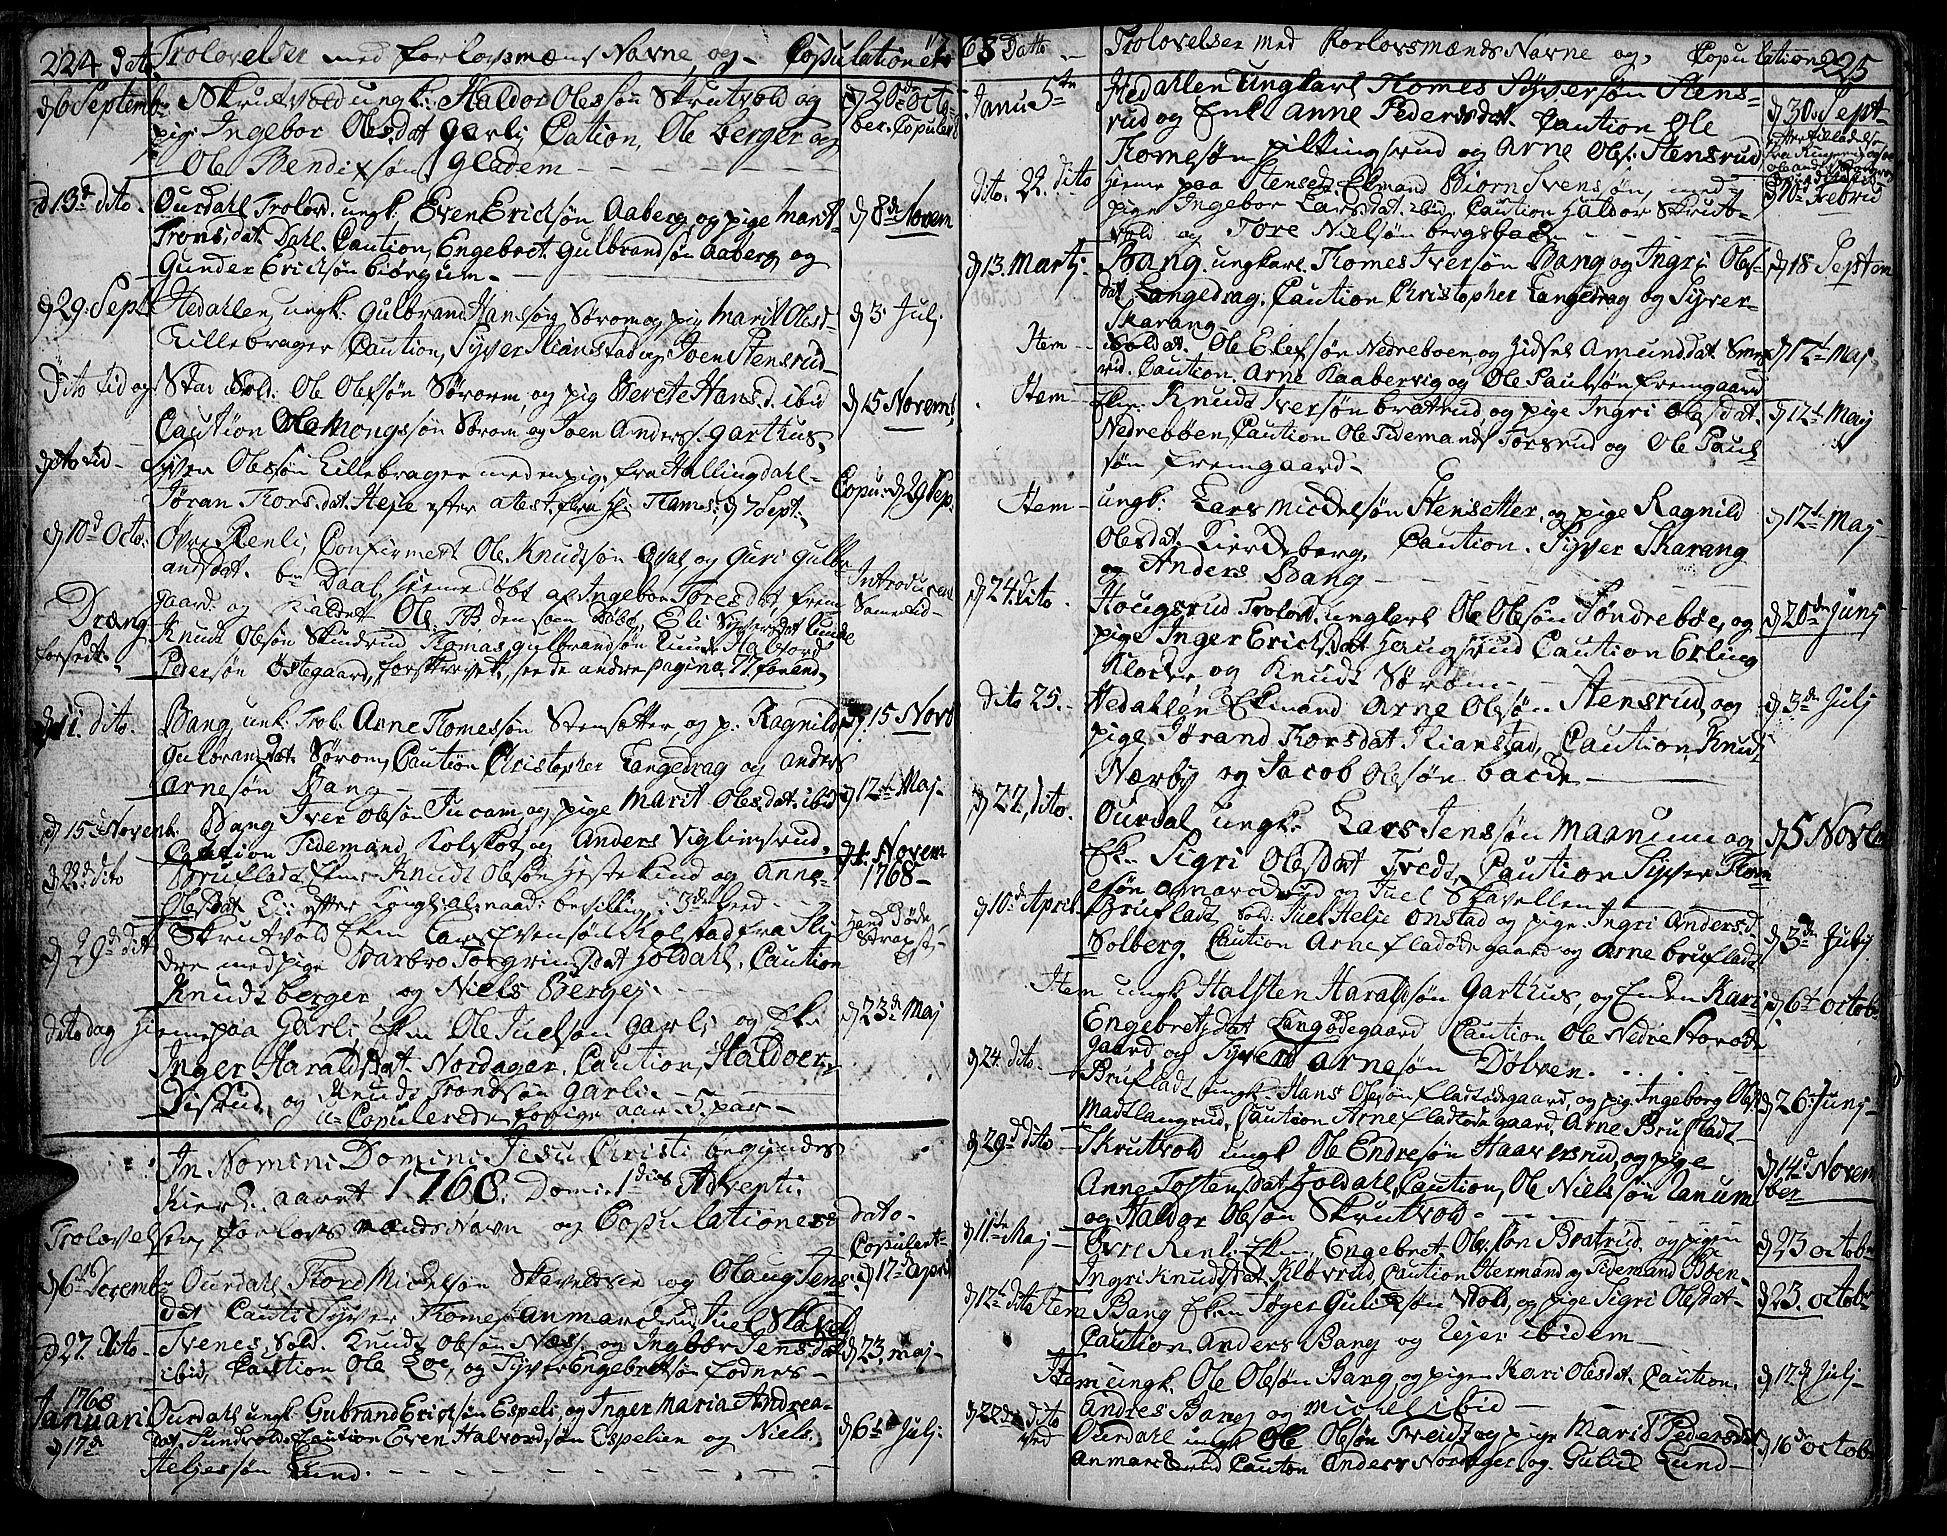 SAH, Aurdal prestekontor, Ministerialbok nr. 5, 1763-1781, s. 224-225